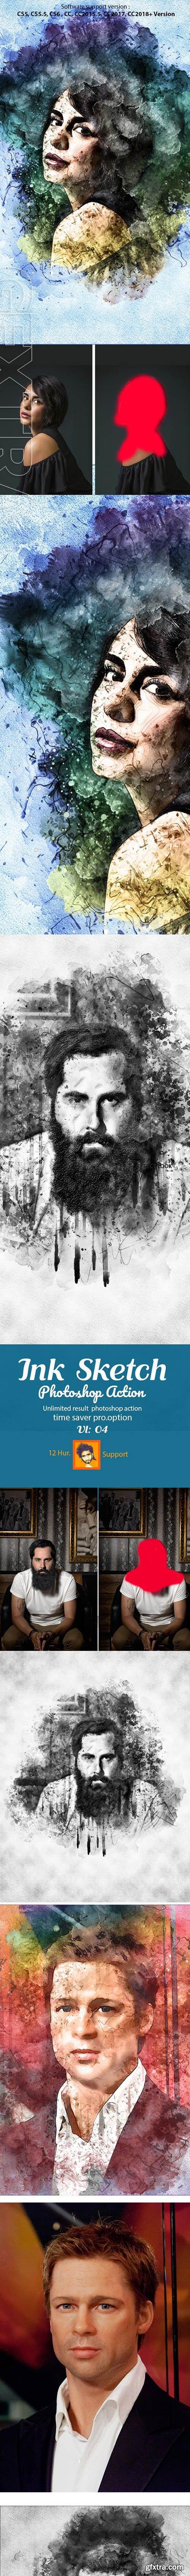 GraphicRiver - Ink Sketch Photoshop Action 22864165